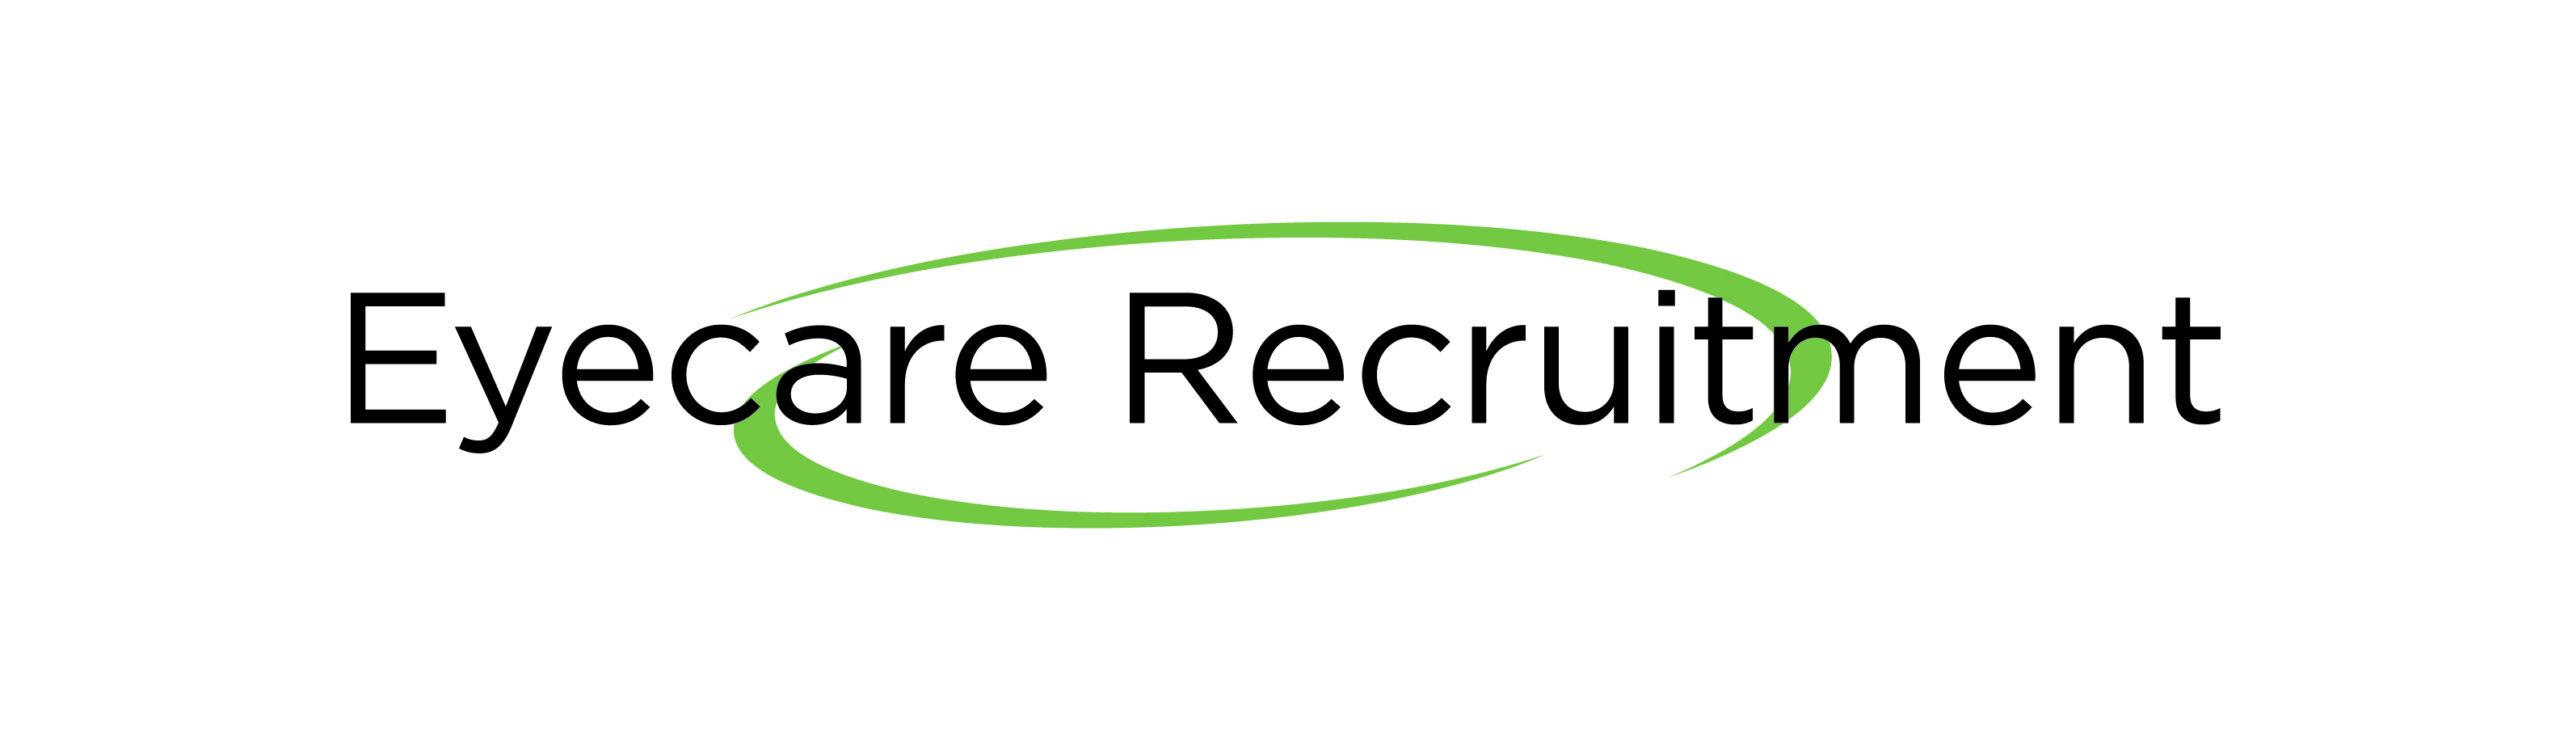 Australia & NZ Specialist Eyecare Recruitment and Locum Agency